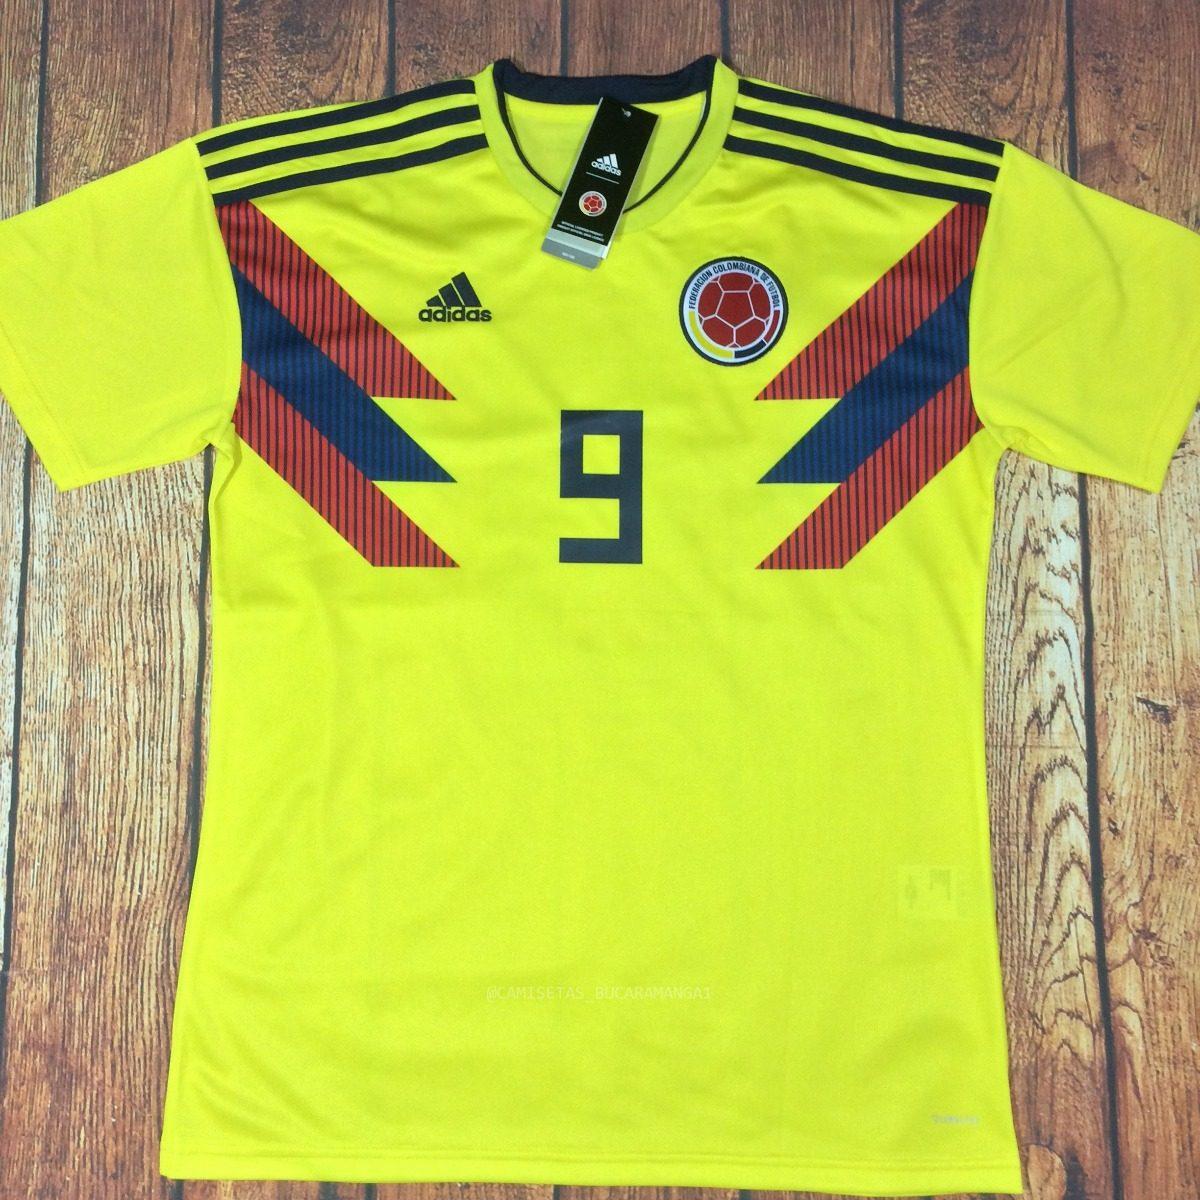 seleccion falcao colombia camiseta futbol adidas climalite. Cargando zoom. d7f31a7096127